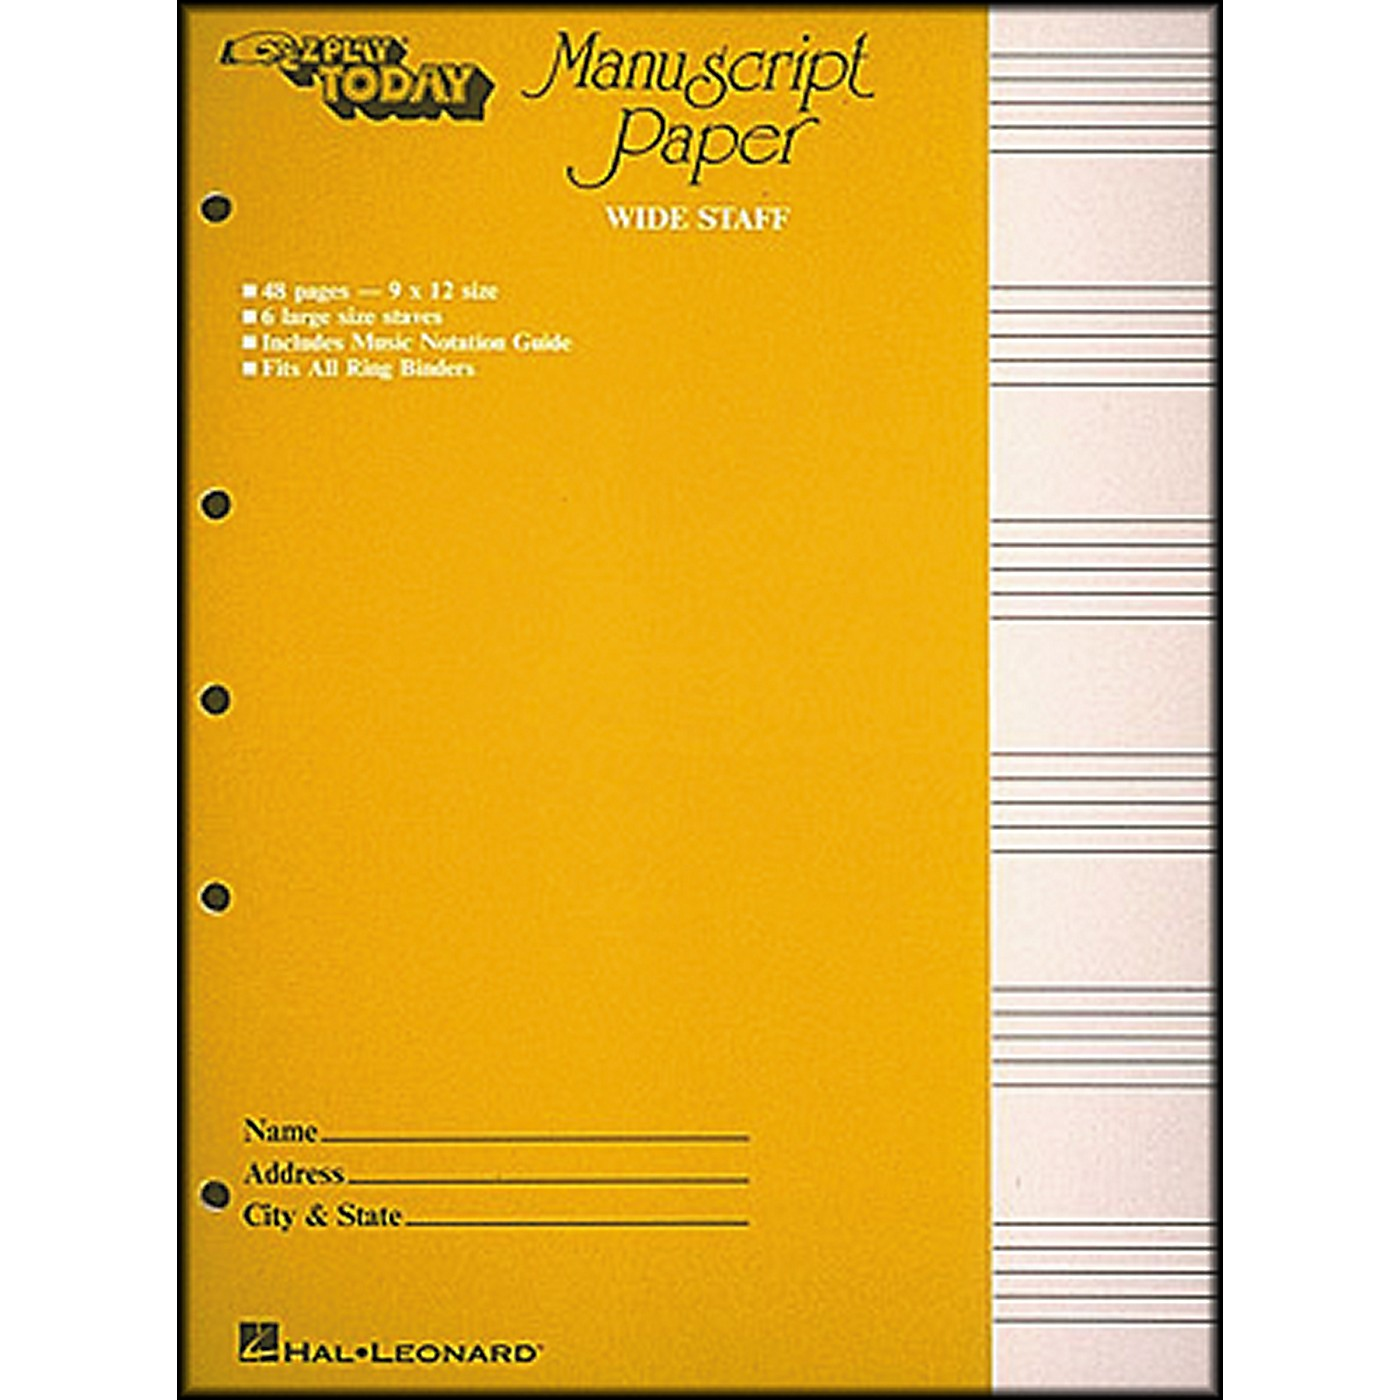 Hal Leonard Manuscript Paper (Wide Staff) 'E-Z Play Today' thumbnail